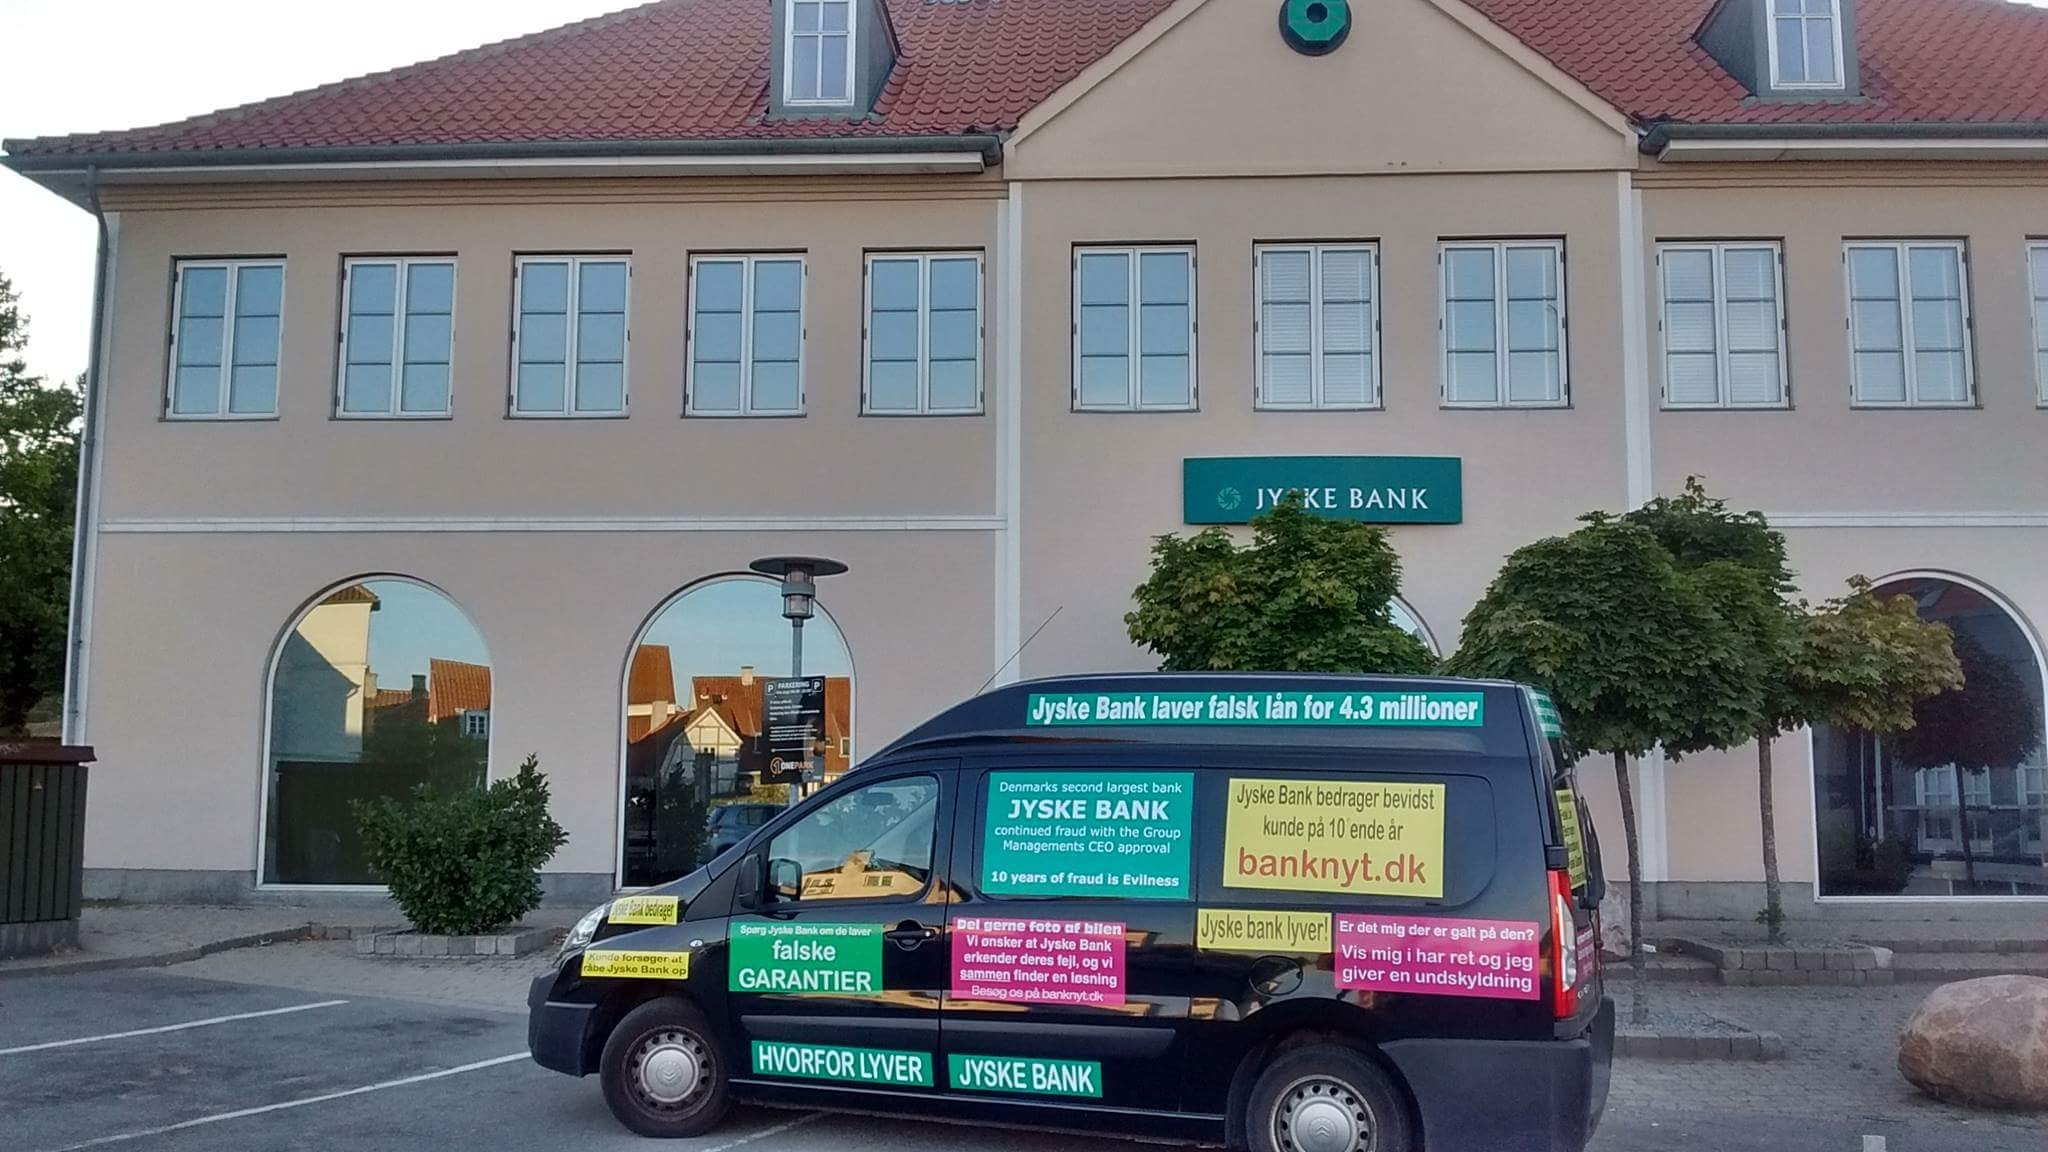 Jysk bank bil #MANDATSVIG #BEDRAGERI #DOKUMENTFALSK #UDNYTTELSE #SVIG #FALSK #Bank #AndersChristianDam #Financial #News #Press #Share #Pol #Recommendation #Sale #Firesale #AndersDam #JyskeBank #ATP #PFA #MortenUlrikGade #PhilipBaruch #LES #BirgitBushThuesen #LundElmerSandager #Nykredit #MetteEgholmNielsen #Loan #Fraud #CasperDamOlsen #NicolaiHansen #AnetteKirkeby #SørenWoergaaed #Gangcrimes #Crimes #Koncernledelse #jyskebank #Koncernbestyrelsen #SvenBuhrkall #KurtBligaardPedersen #RinaAsmussen #PhilipBaruch #JensABorup #KeldNorup #ChristinaLykkeMunk #HaggaiKunisch #MarianneLillevang #Koncerndirektionen #AndersDam #LeifFLarsen #NielsErikJakobsen #PerSkovhus #PeterSchleidt Rødstenen advokater Thomas Schioldan Sørensen. Lundgrens advokater partner Dan Terkildsen Lundgrens Niels Gram- Hanssen, Pedram Moghaddam, Dan Terkildsen, Tobias Vieth og Thomas Stampe, flytter til nyt kontor i Tuborg Havn